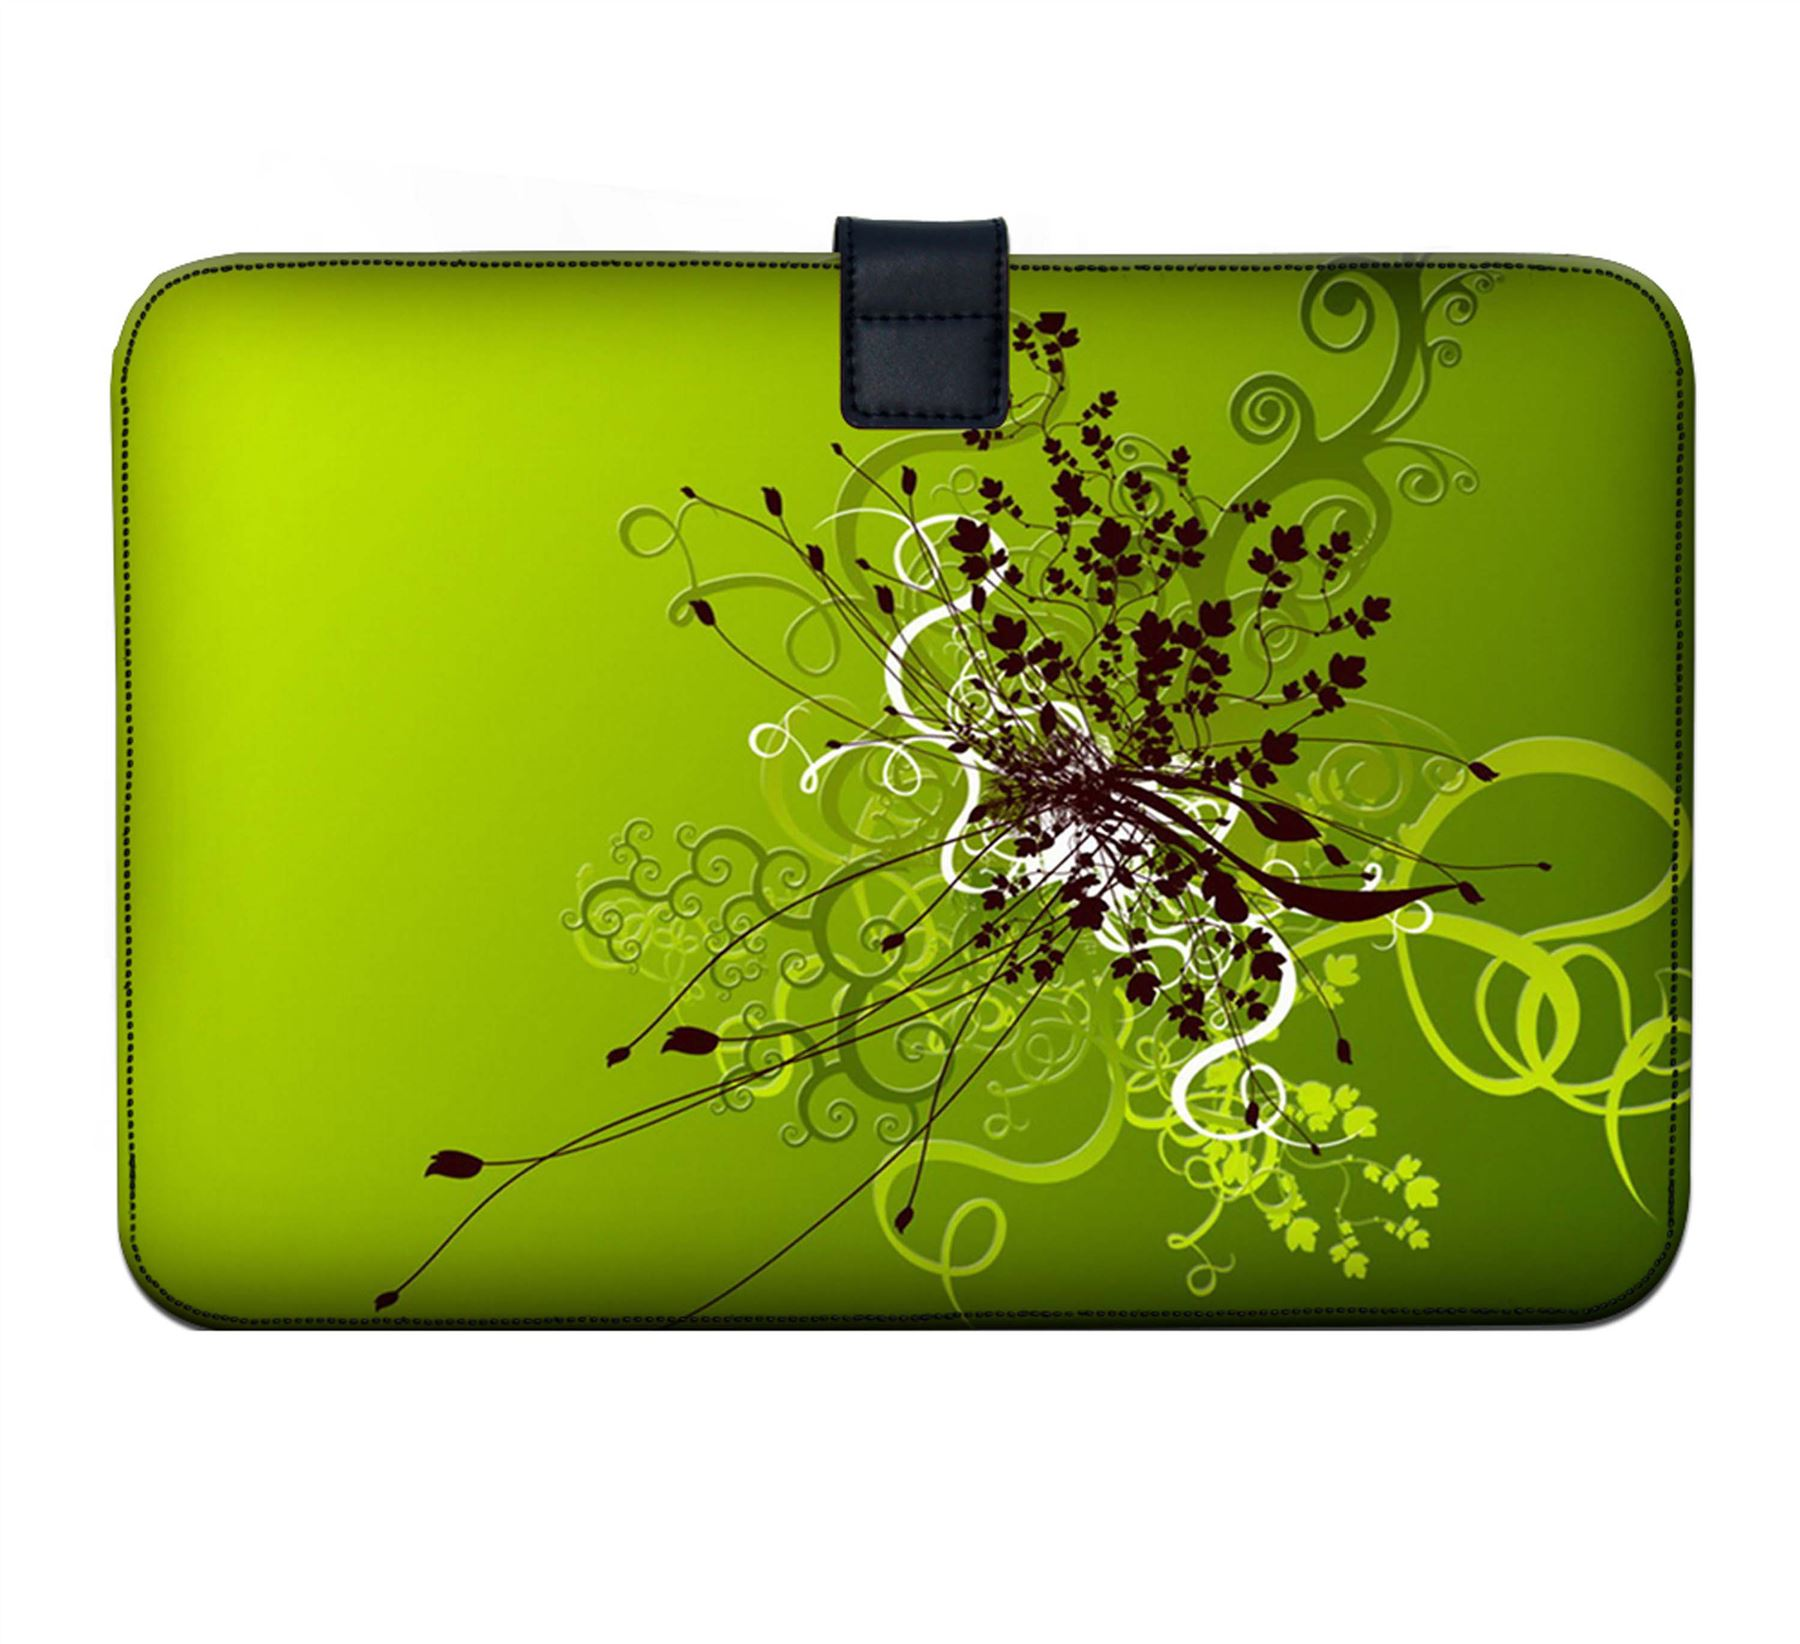 Luxburg-11-034-13-034-pouces-Housse-Sacoche-Pochette-pour-MacBook-Air-Series-Retina